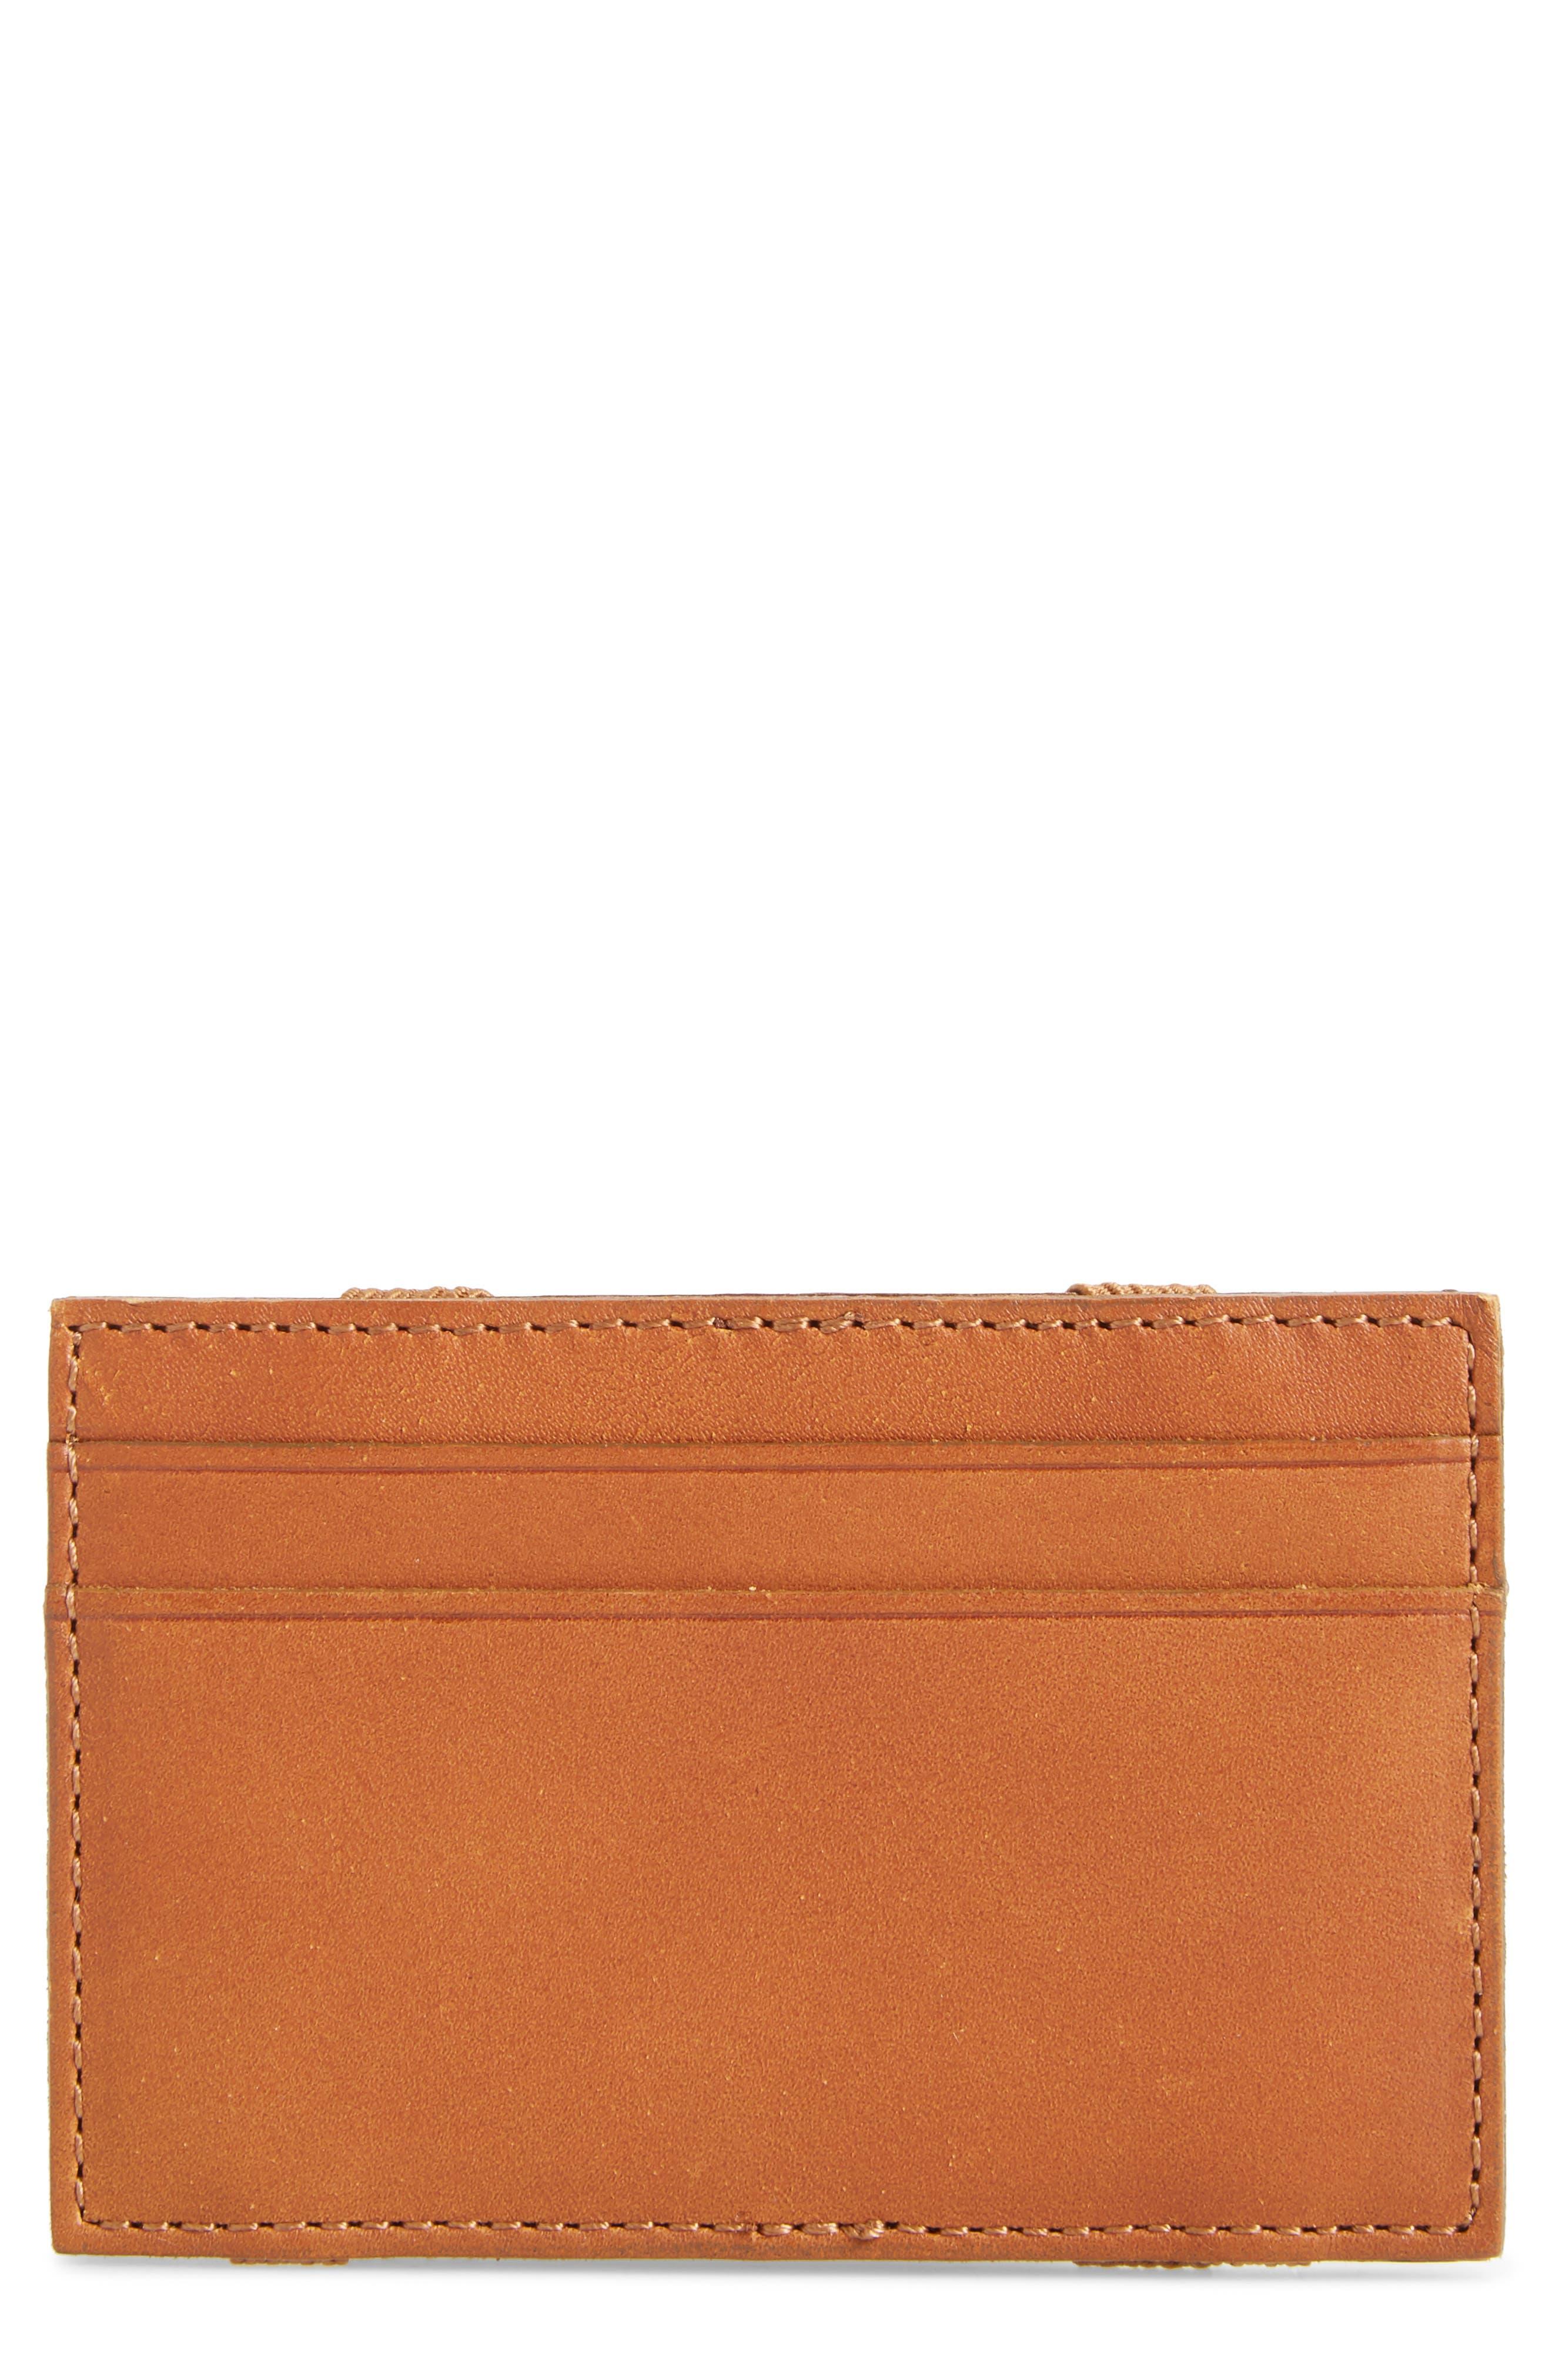 J.CREW Magic Leather Wallet, Main, color, 200